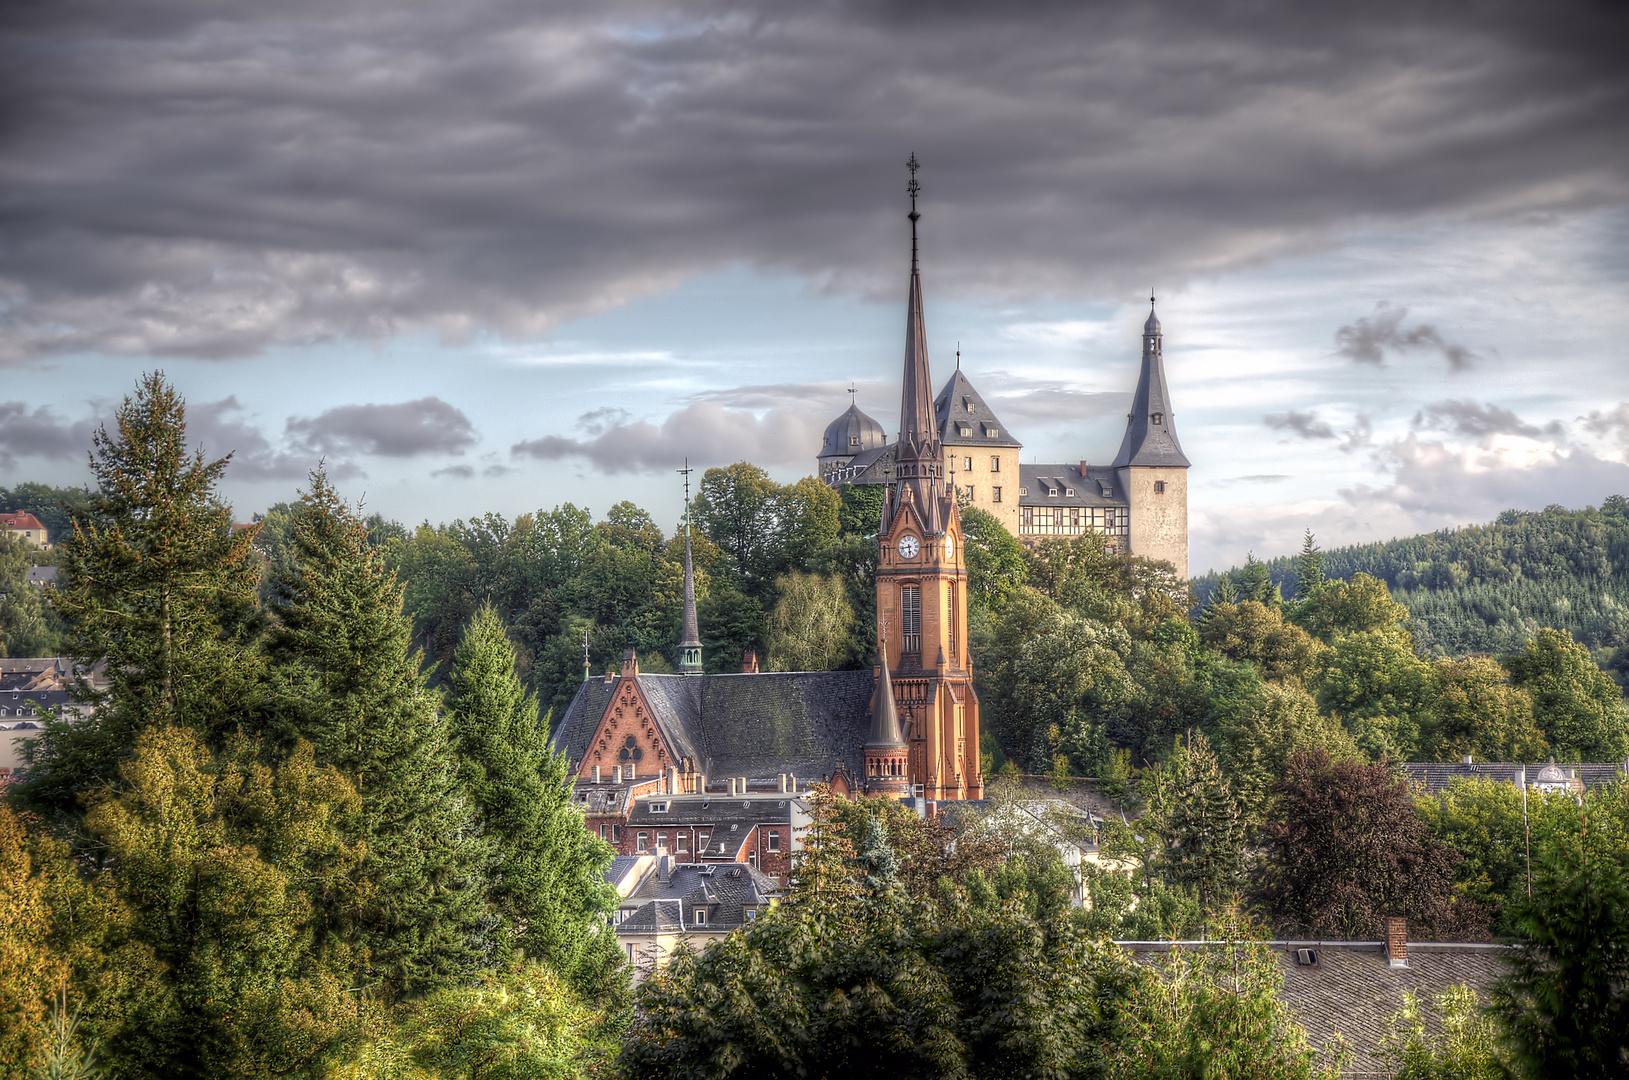 Mylau / Vogtland / Saxony / Church & Castle [ RELOAD ] with Photomatix